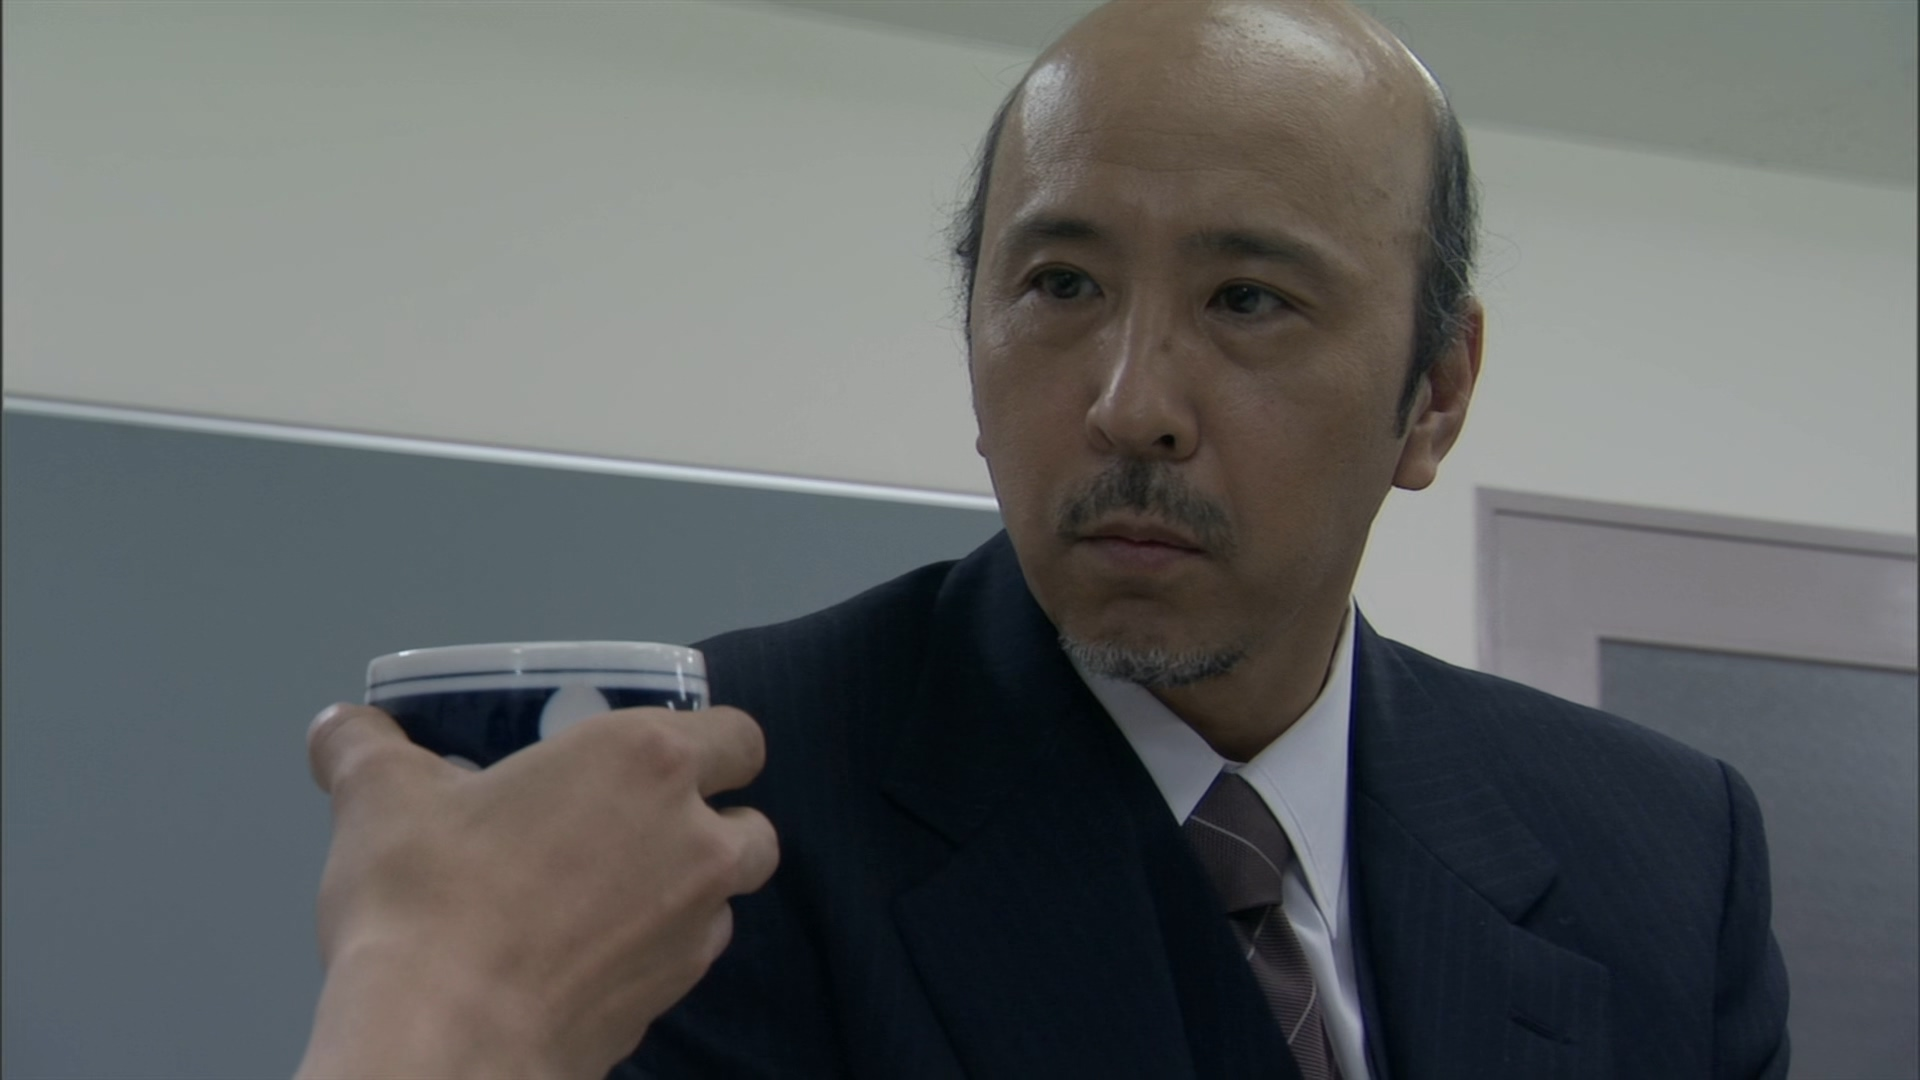 Detective of Gurongi Countermeasures Team